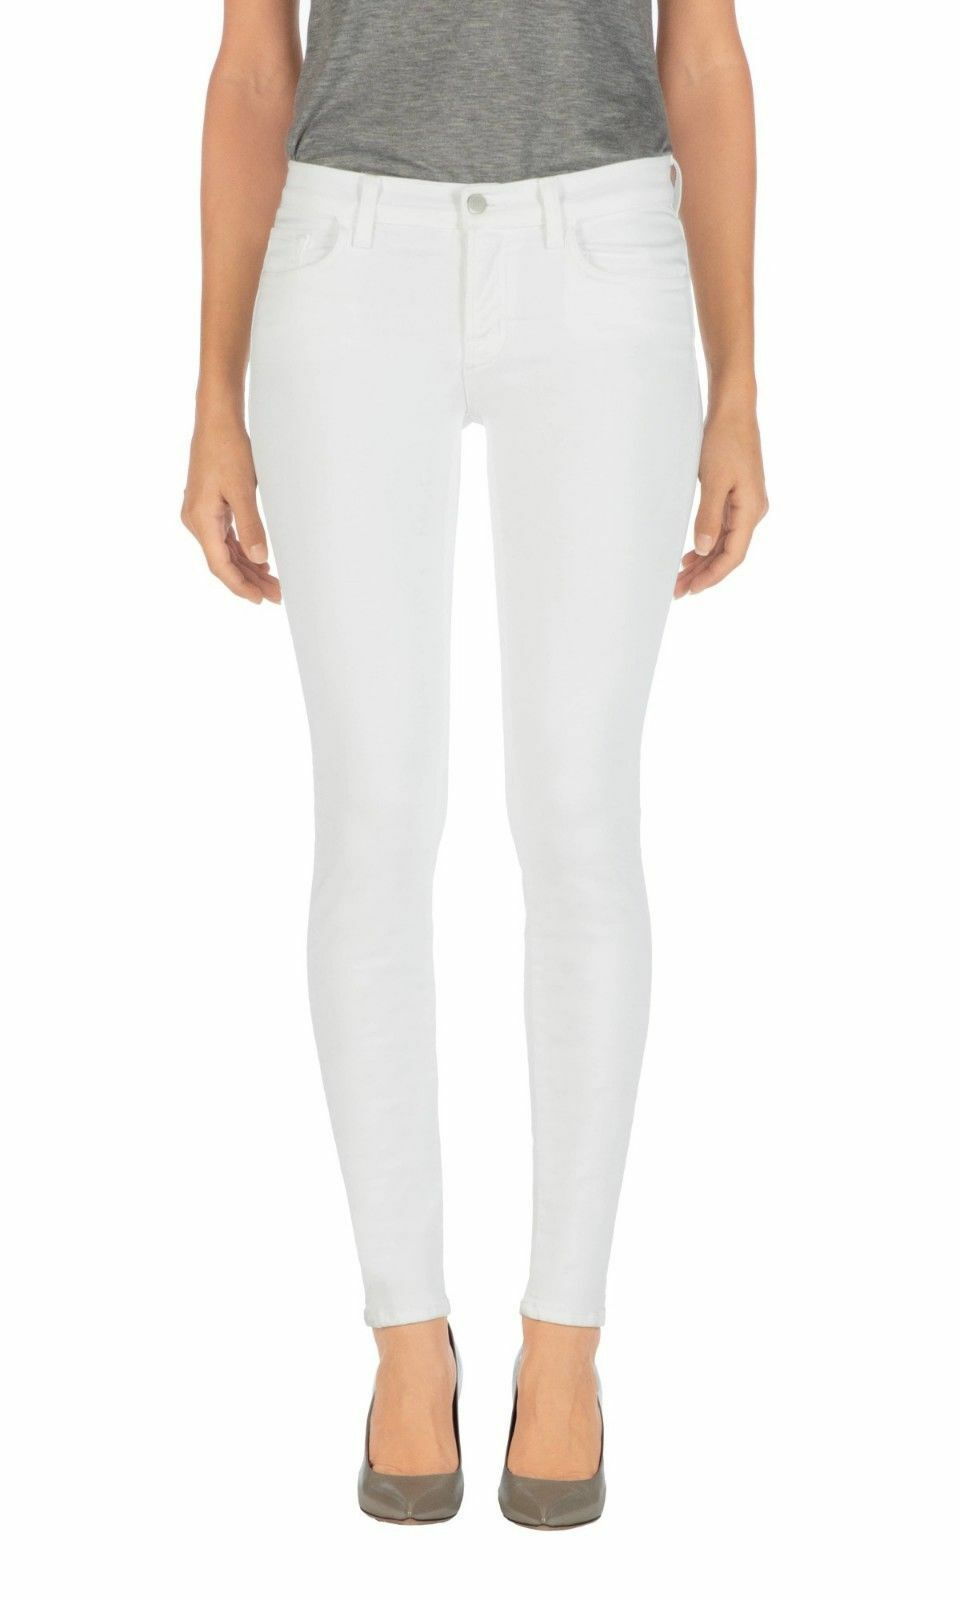 J Brand 811 Mid Rise Skinny white White Jean C028  172 NWT 32